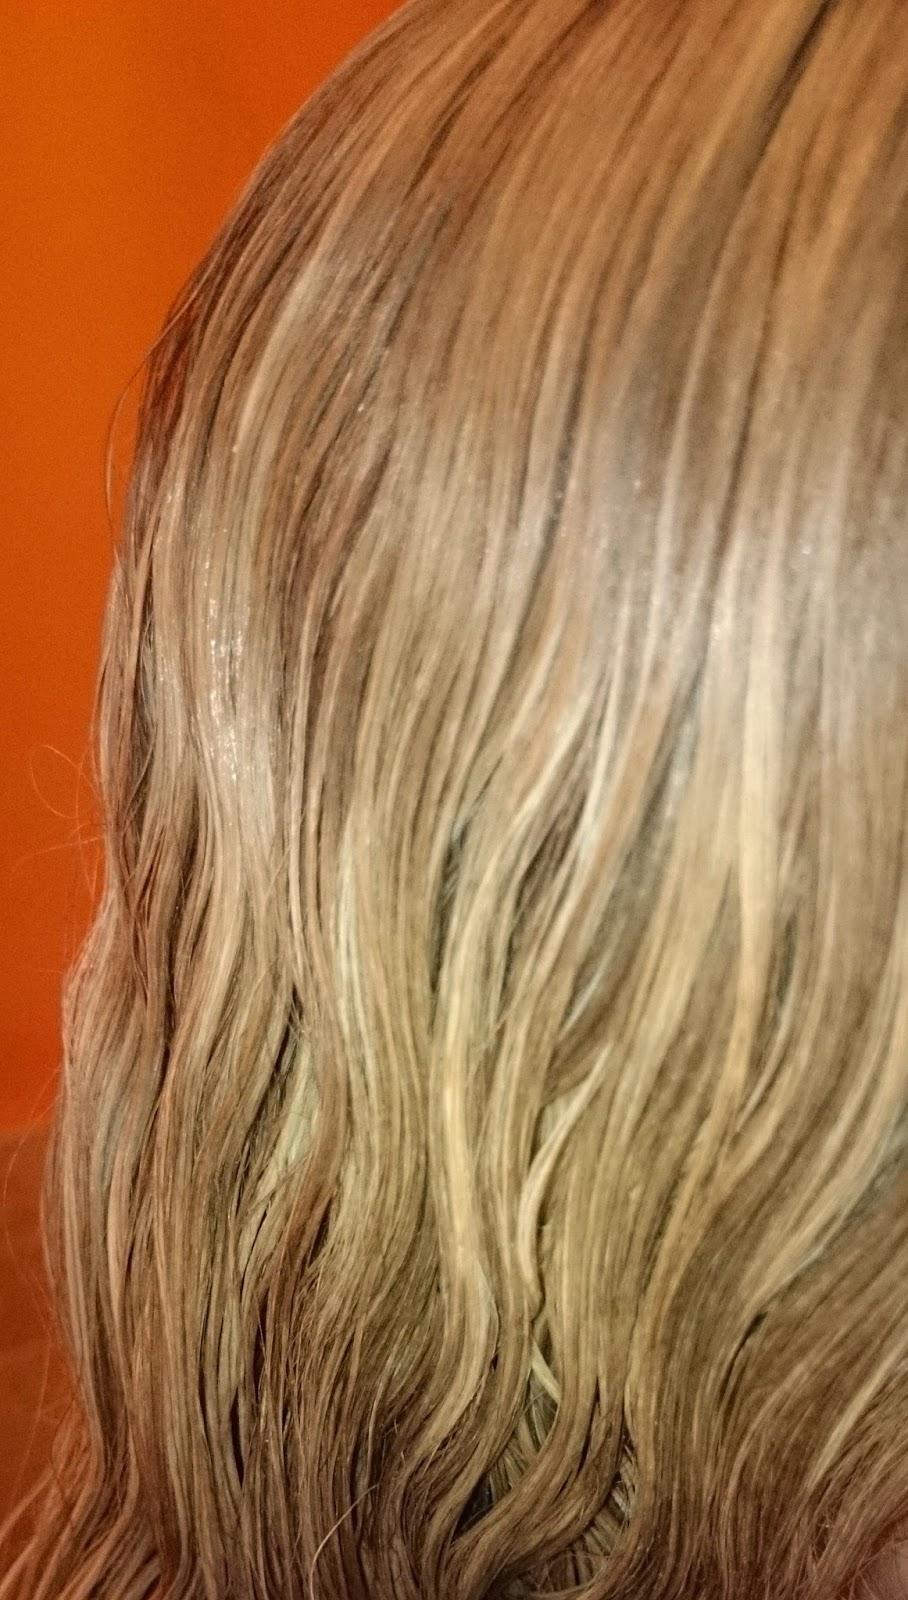 l'oreal preference glam highlights kit hair dye home DIY